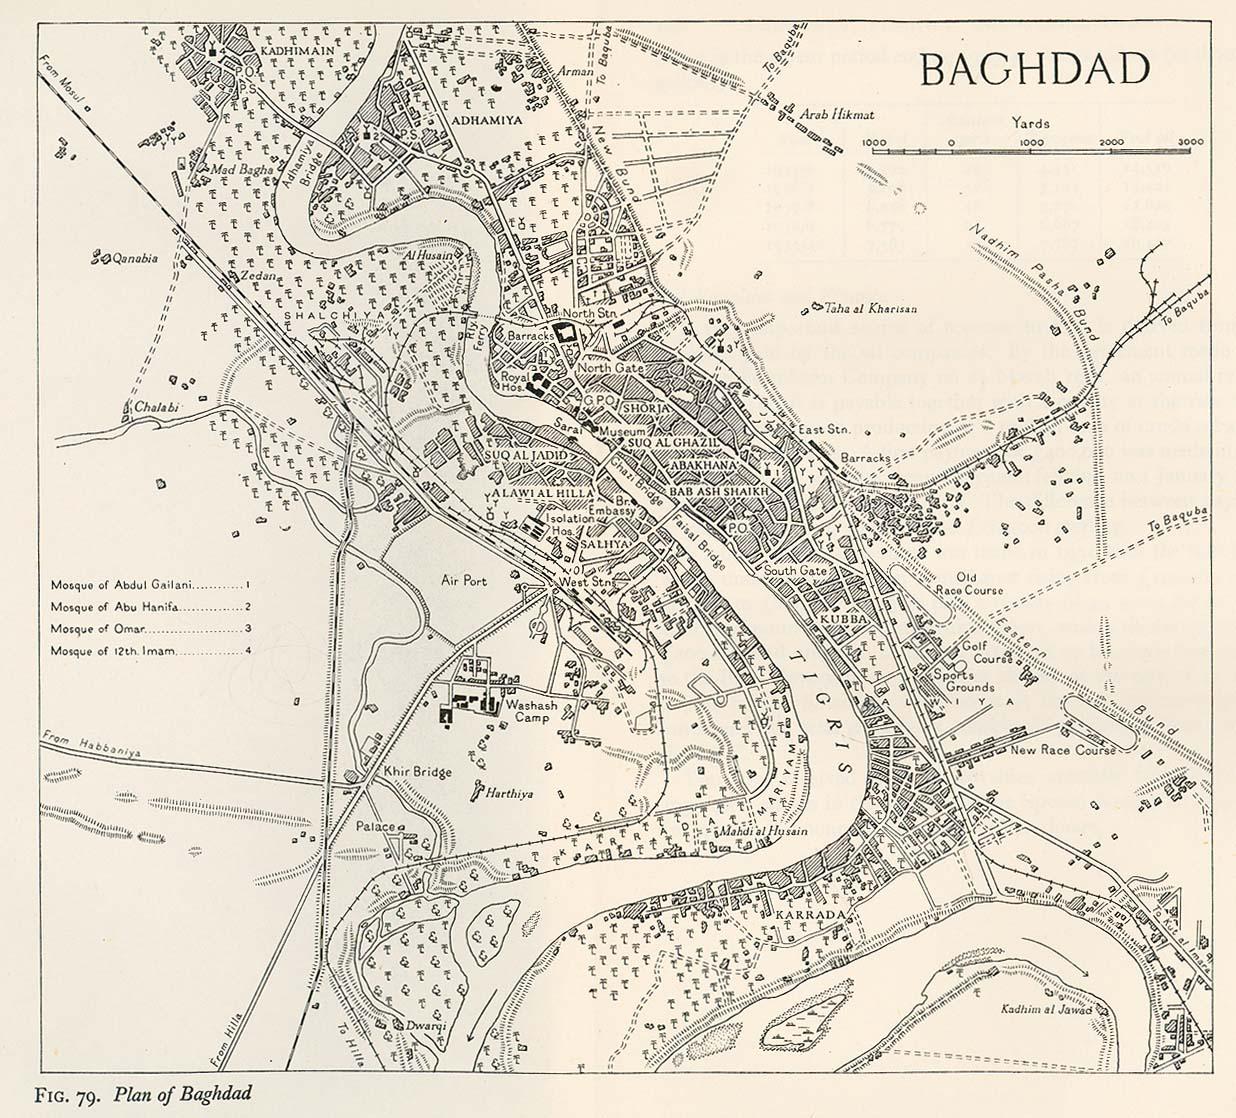 Bagdad 1944